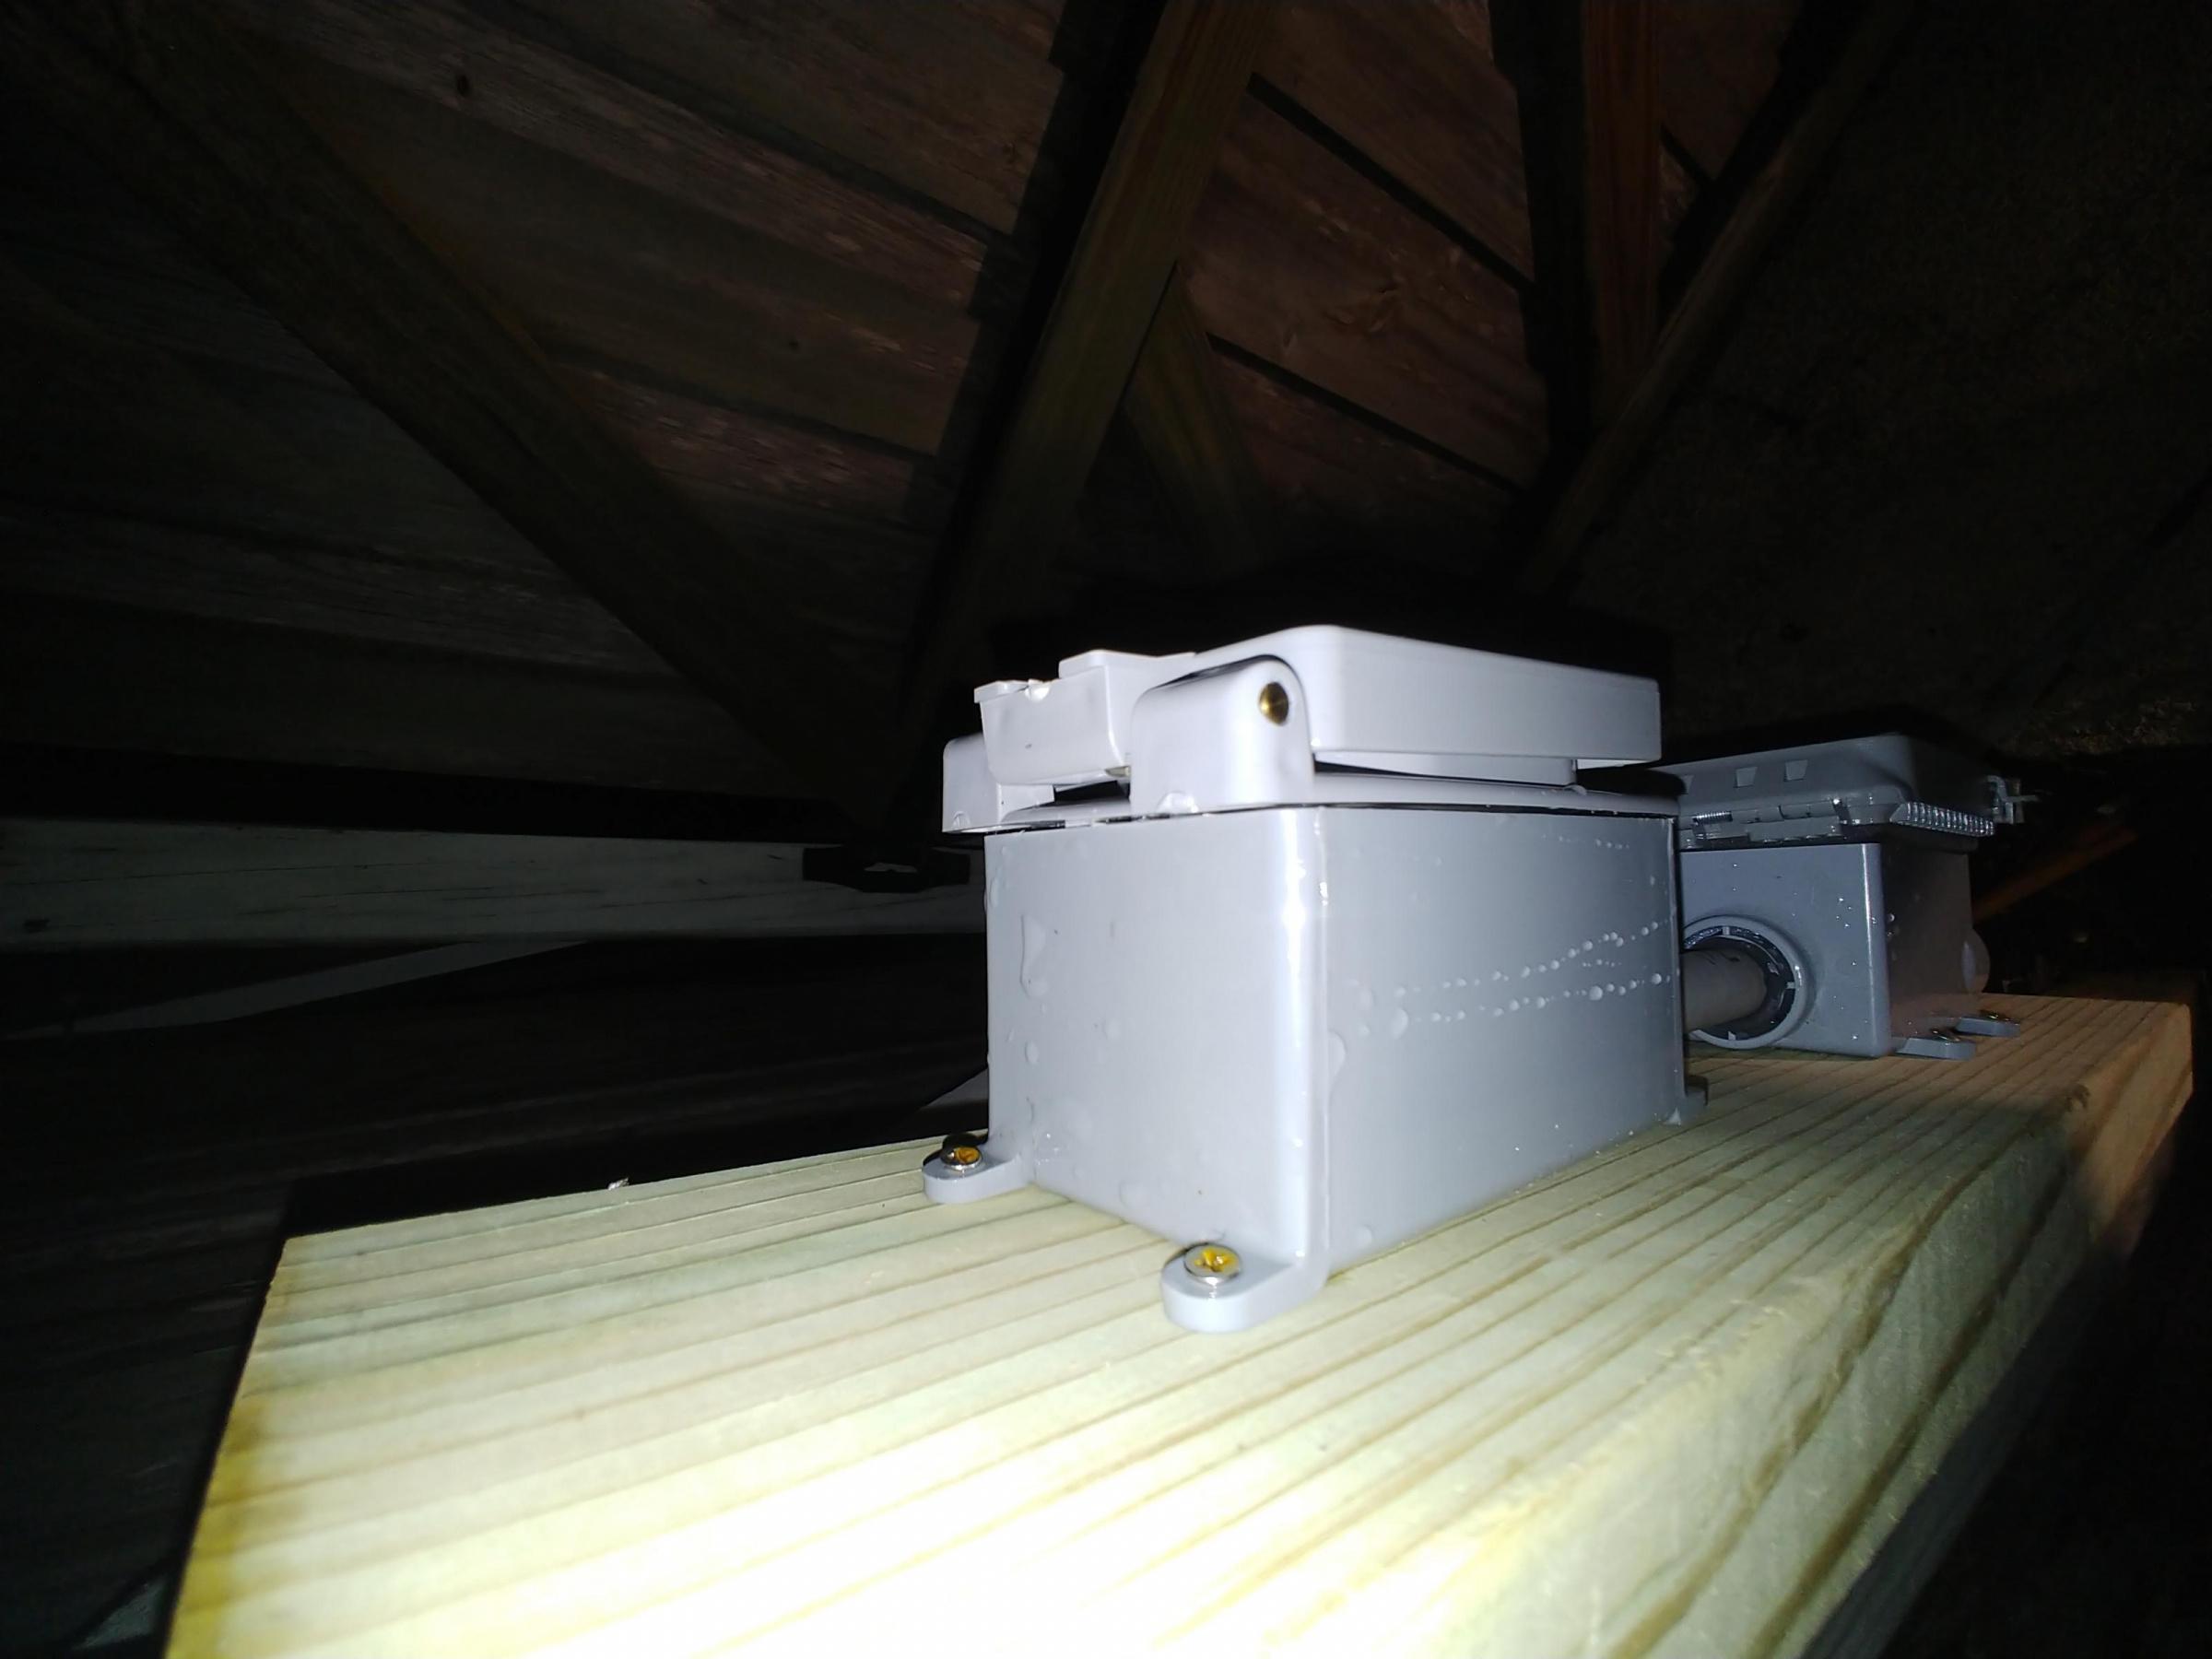 Pool light electrical safety-20191229_202125_1577669037978.jpg